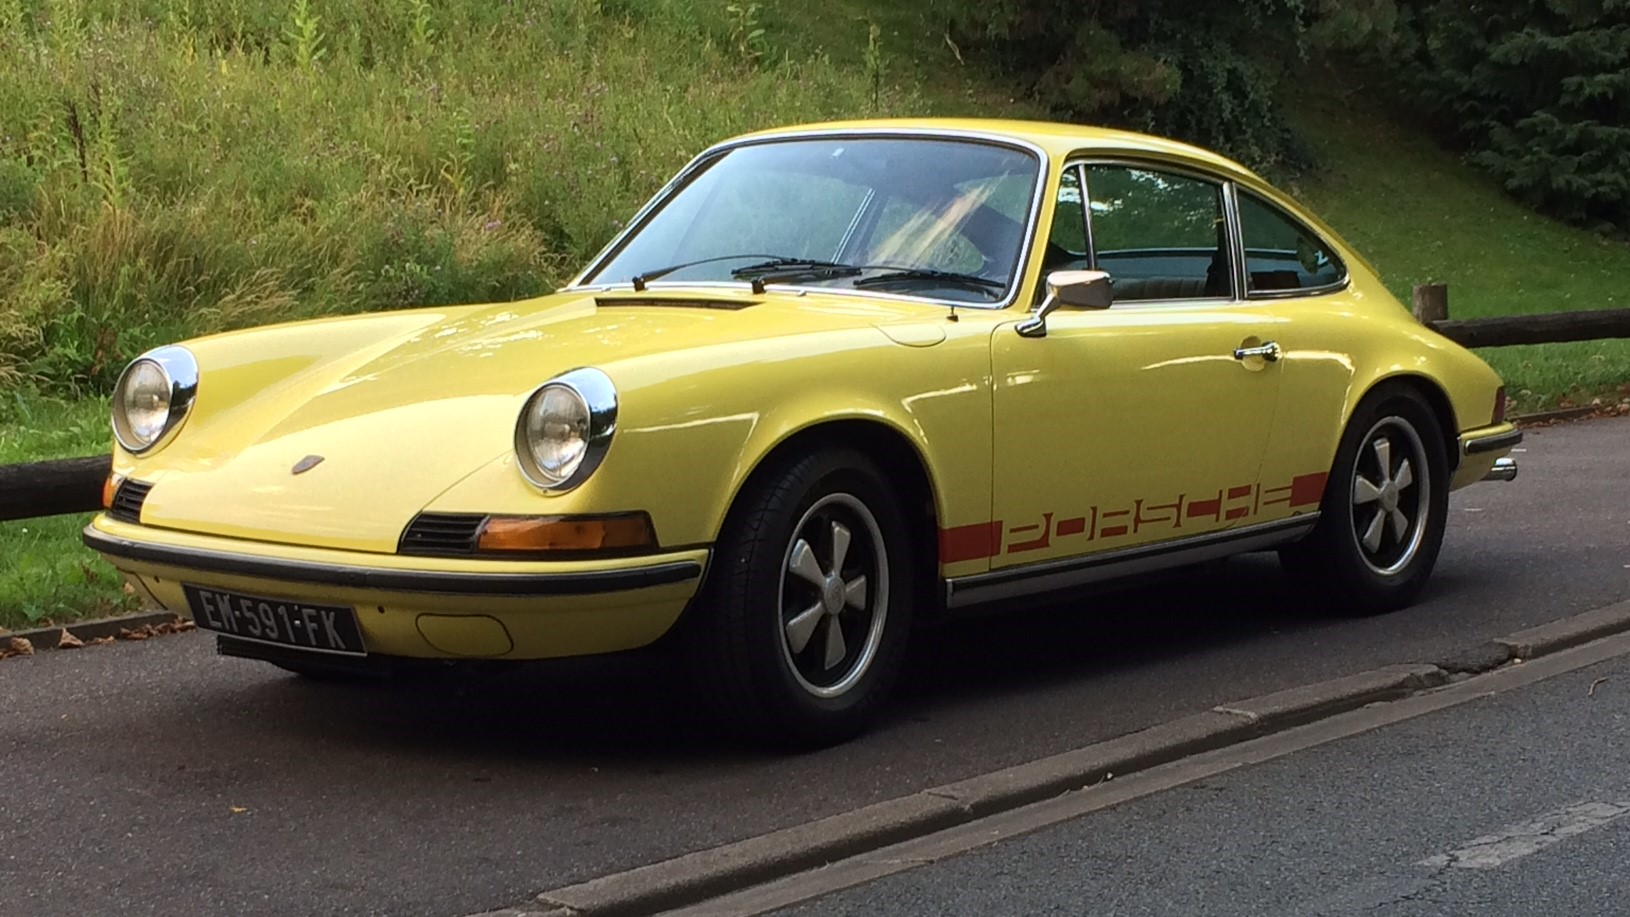 Porsche9112.4TE197305314.JPG